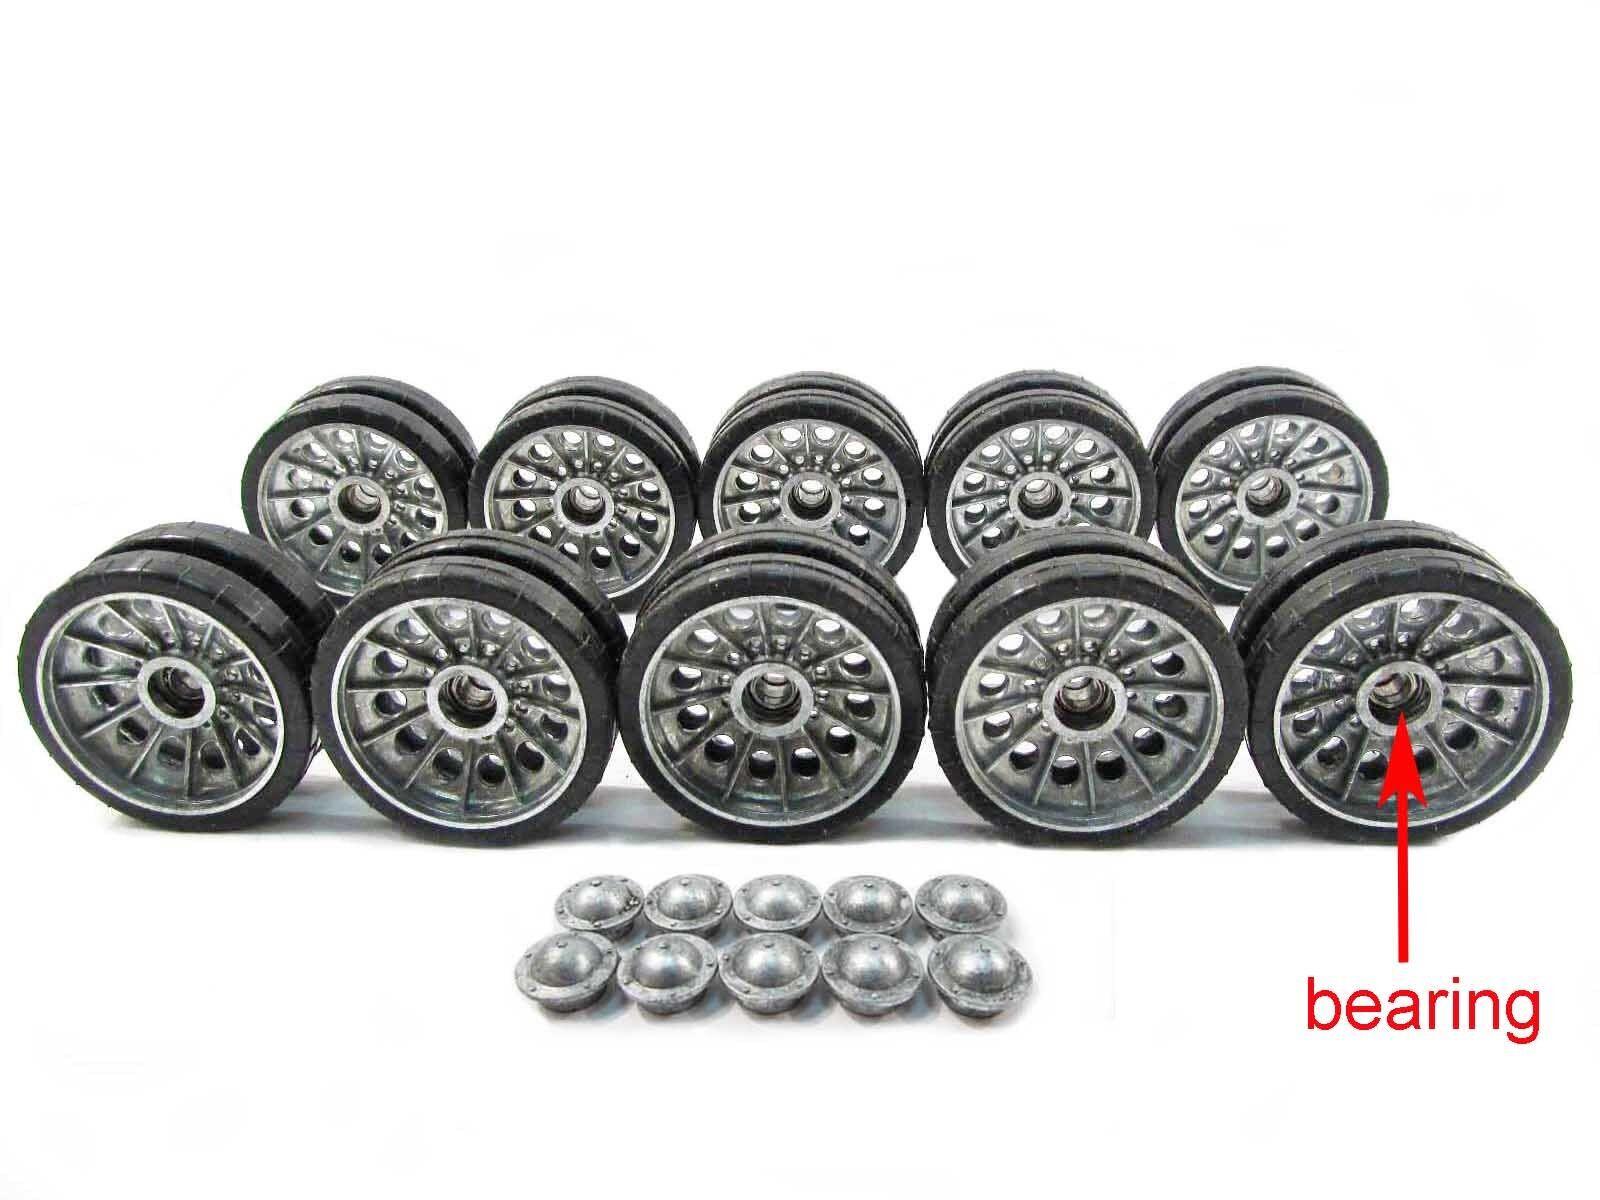 Mato 1 16 T-34 85 Metal Road Wheel Set with bearing MT183